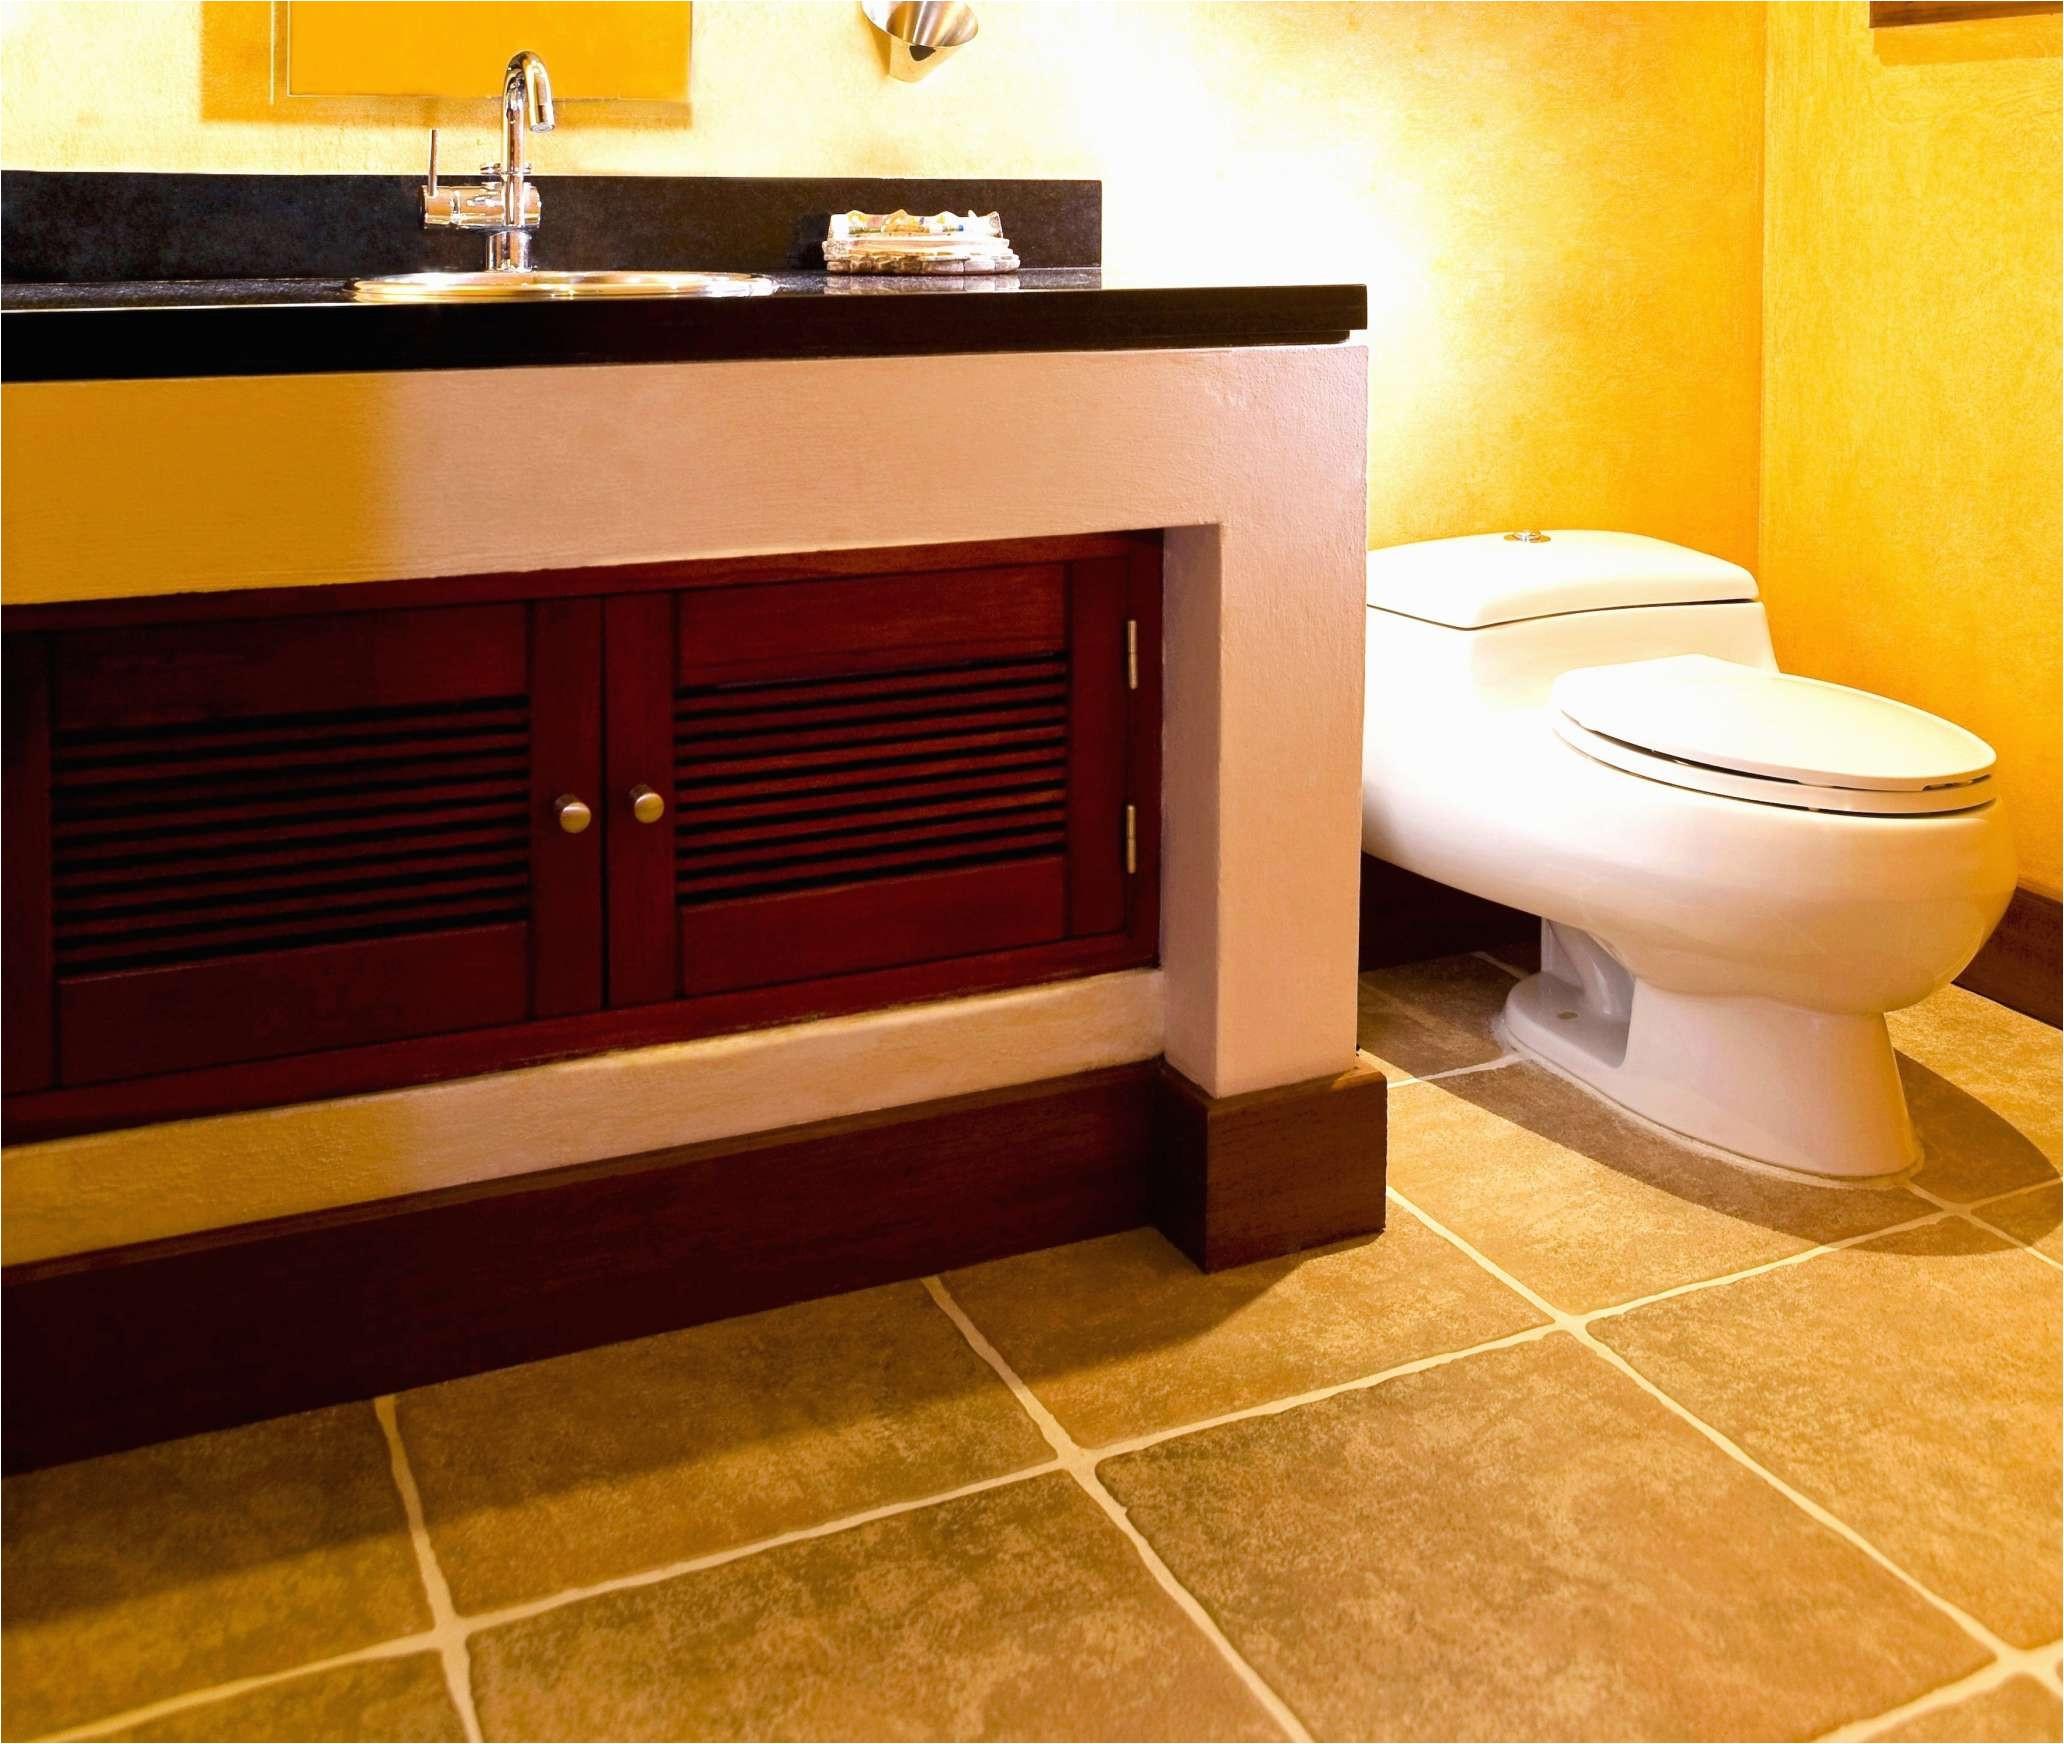 hardwood floor direction of porcelain floor tile bradshomefurnishings throughout floor tiles mosaic bathroom 0d new bathroom floor tiles home